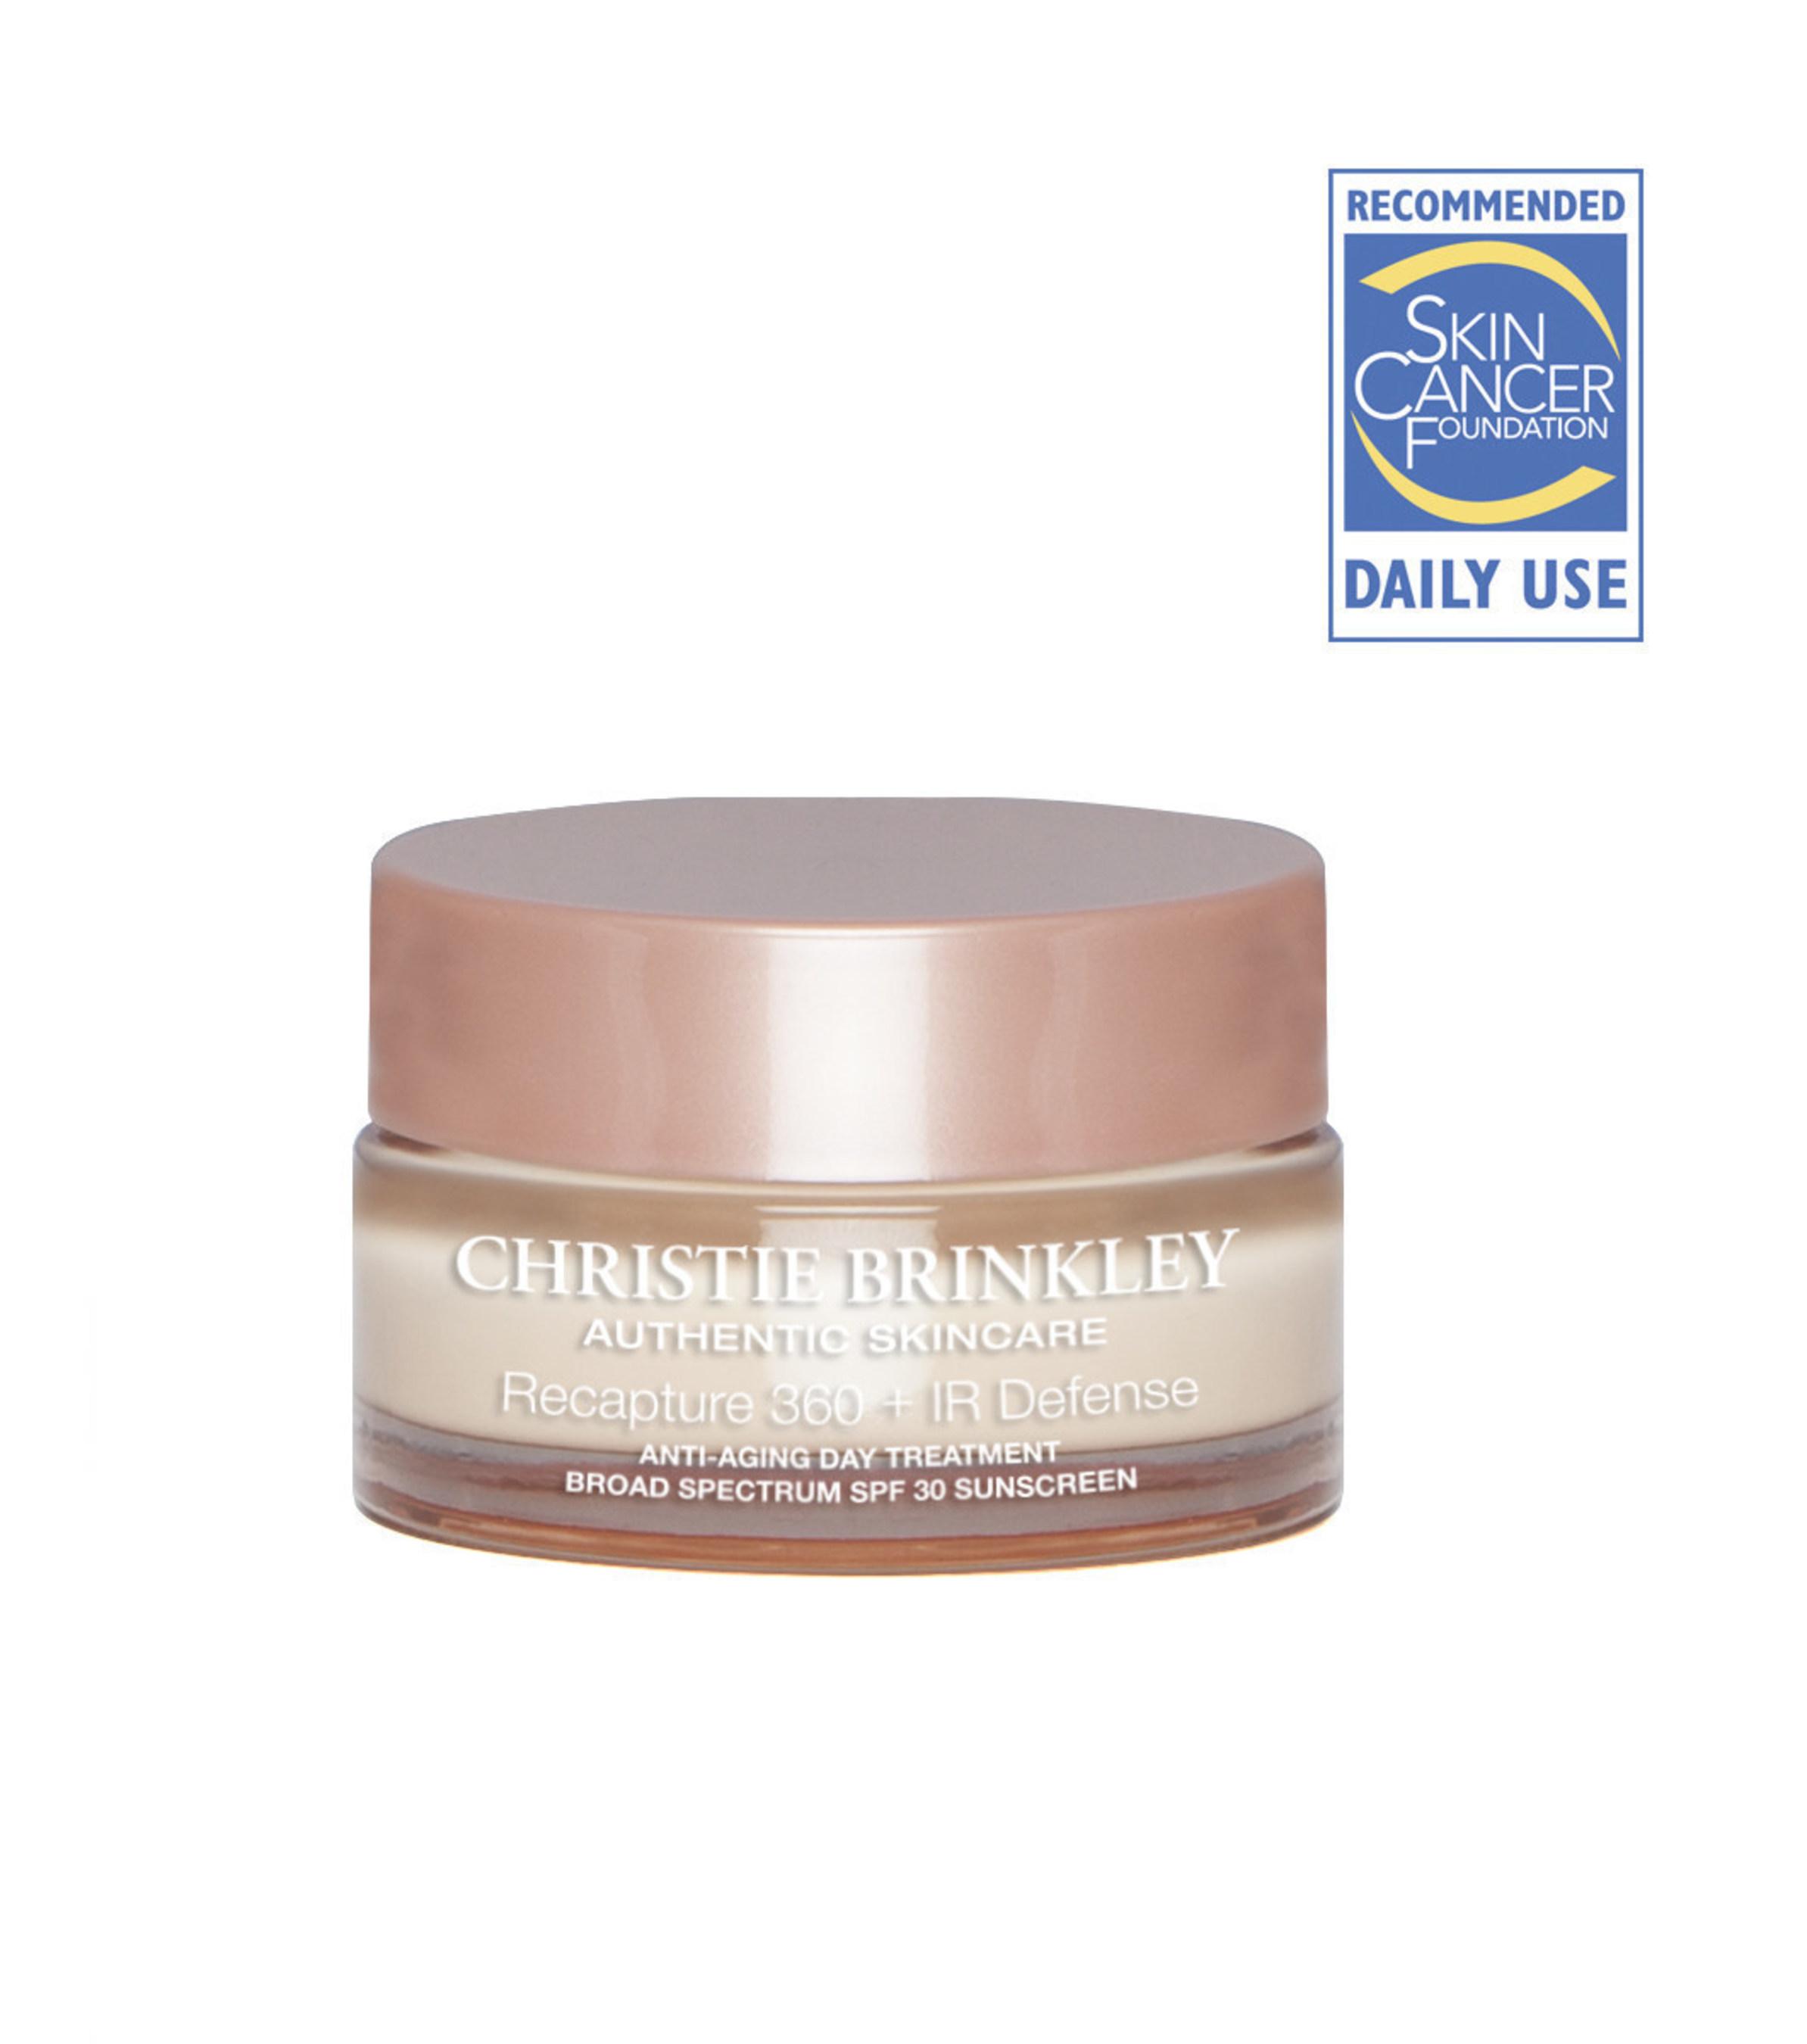 Christie Brinkley Authentic Skincare 360 + IR Defense Anti-Aging Day Cream